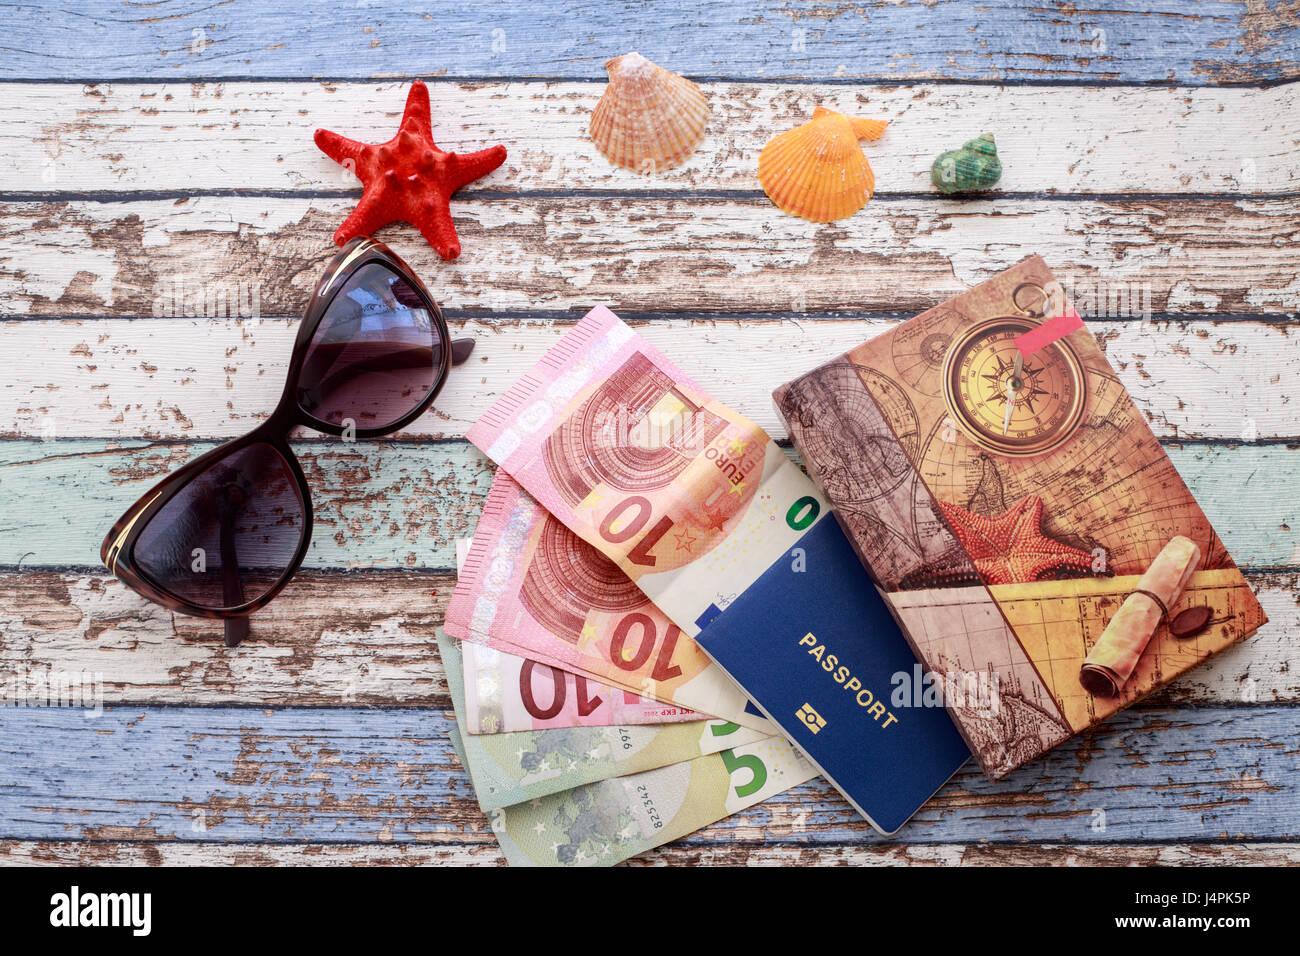 Travel concept: seashells, sunglasses, passport, money and journal on vintage table Stock Photo